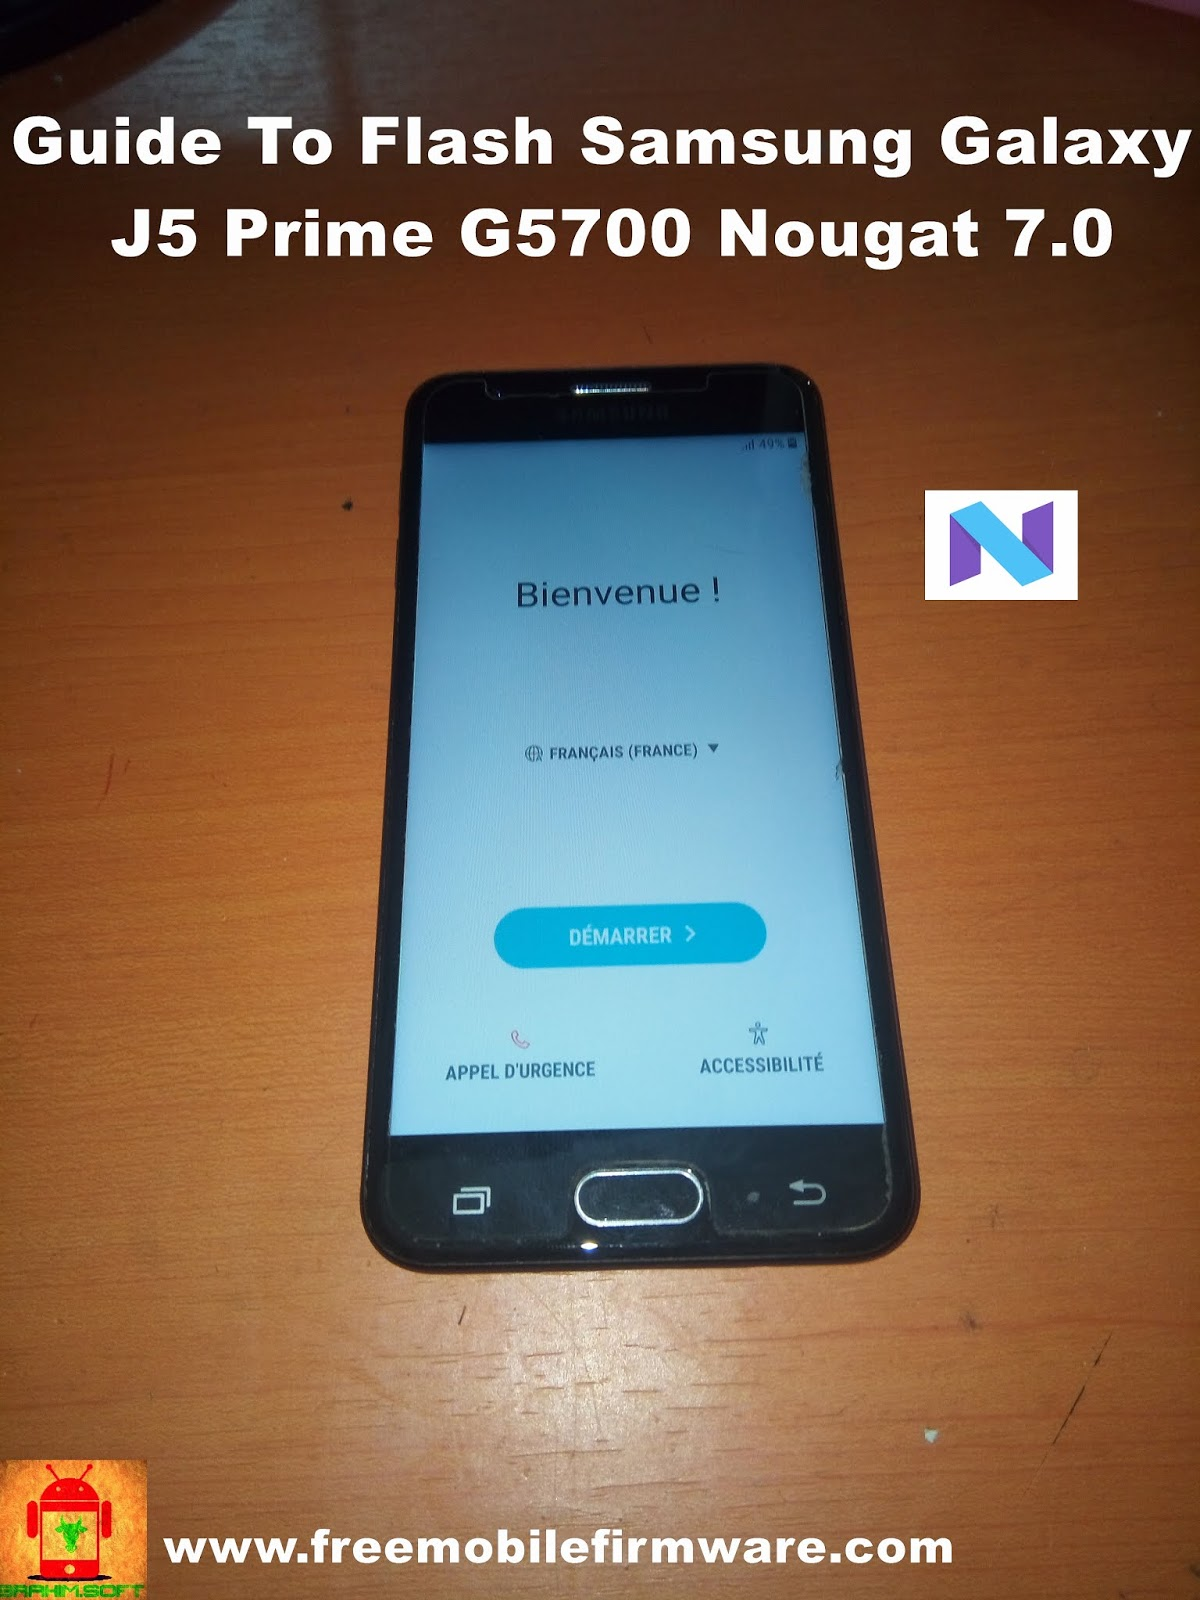 Guide To Flash Samsung Galaxy J5 Prime G5700 Nougat 7 0 Odin Method